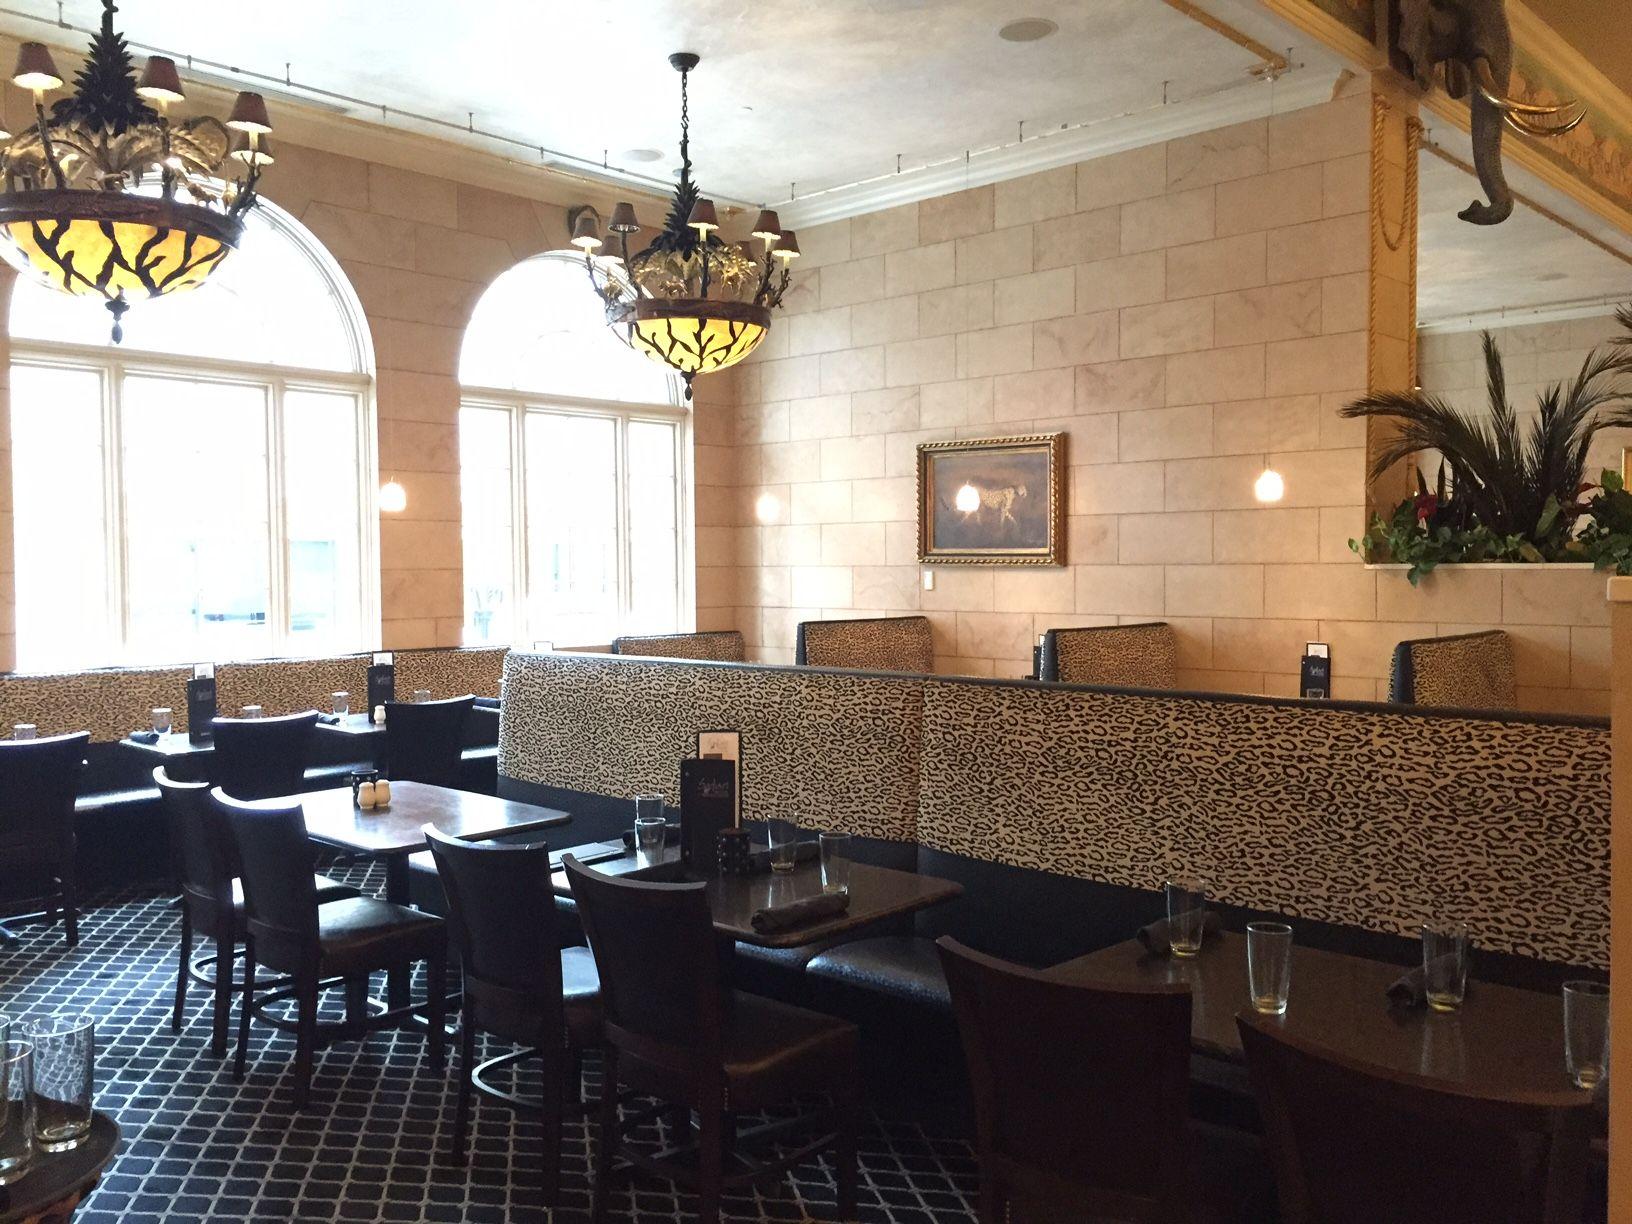 Safari Room Dining Area Safari Room Dining Area Happy Hour Food